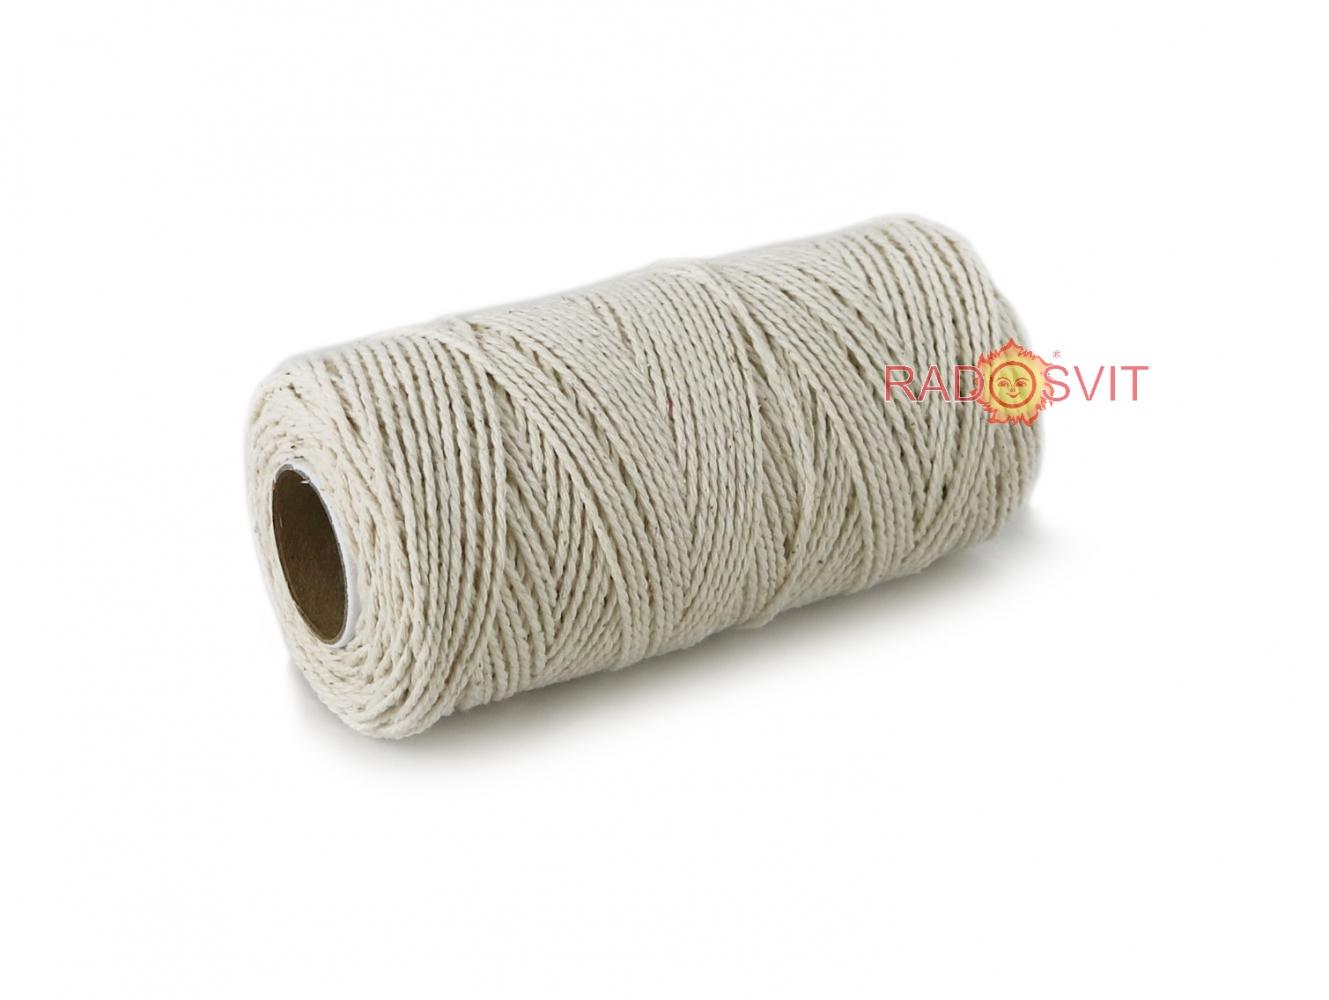 Cotton twine, 120 meters in bobbin - 1